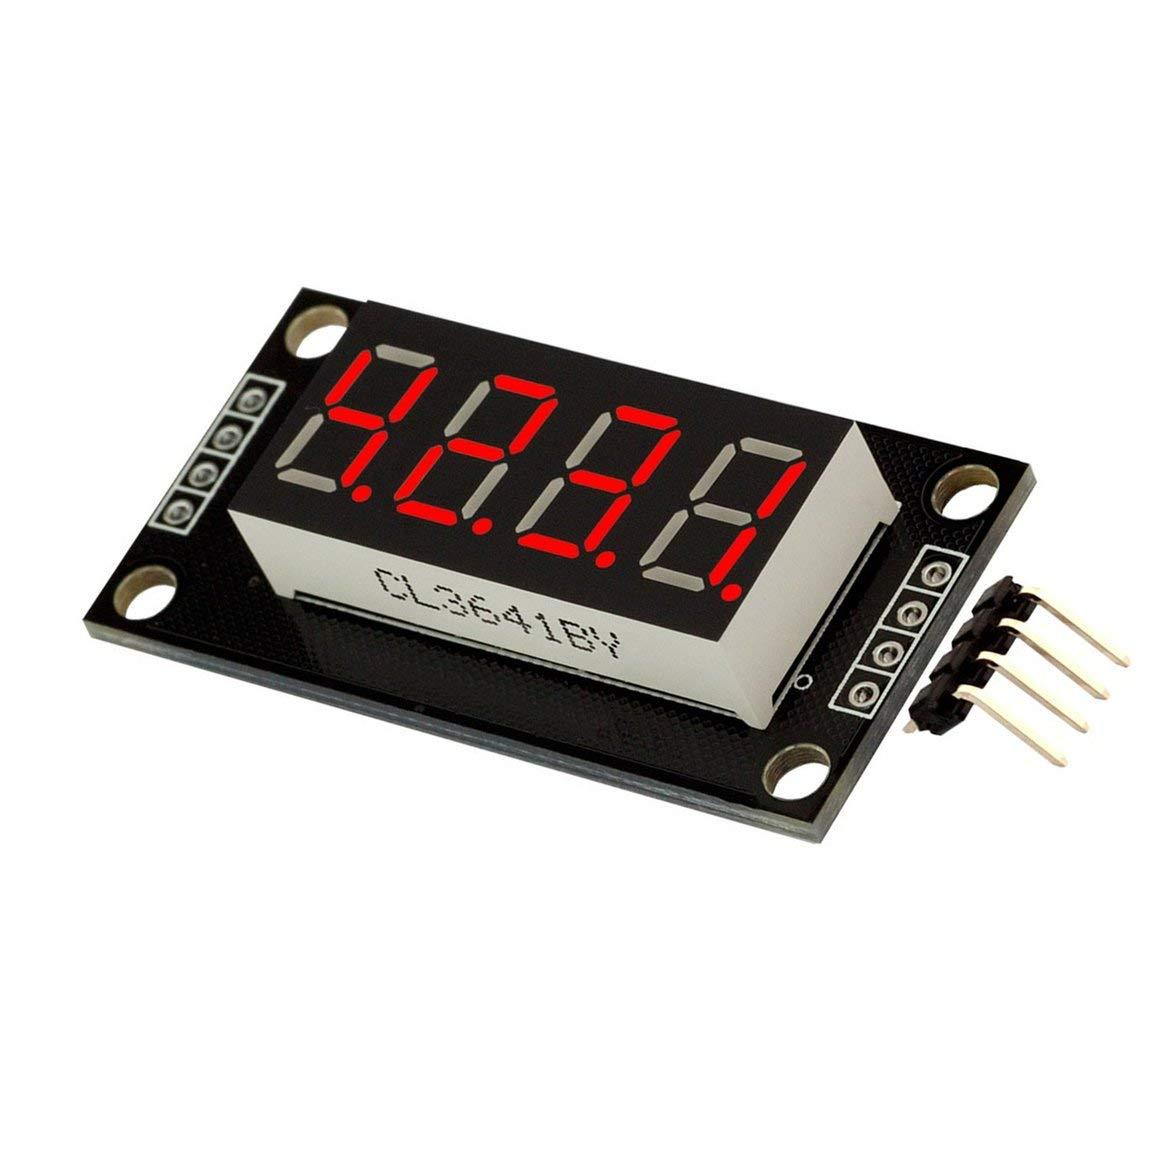 0.36 pulgadas TM1637 4 d/ígitos LED M/ódulo de pantalla de tubo digital 7-Segmento Digital Tube Serial Board Board para Arduino Kits de bricolaje JBP-X